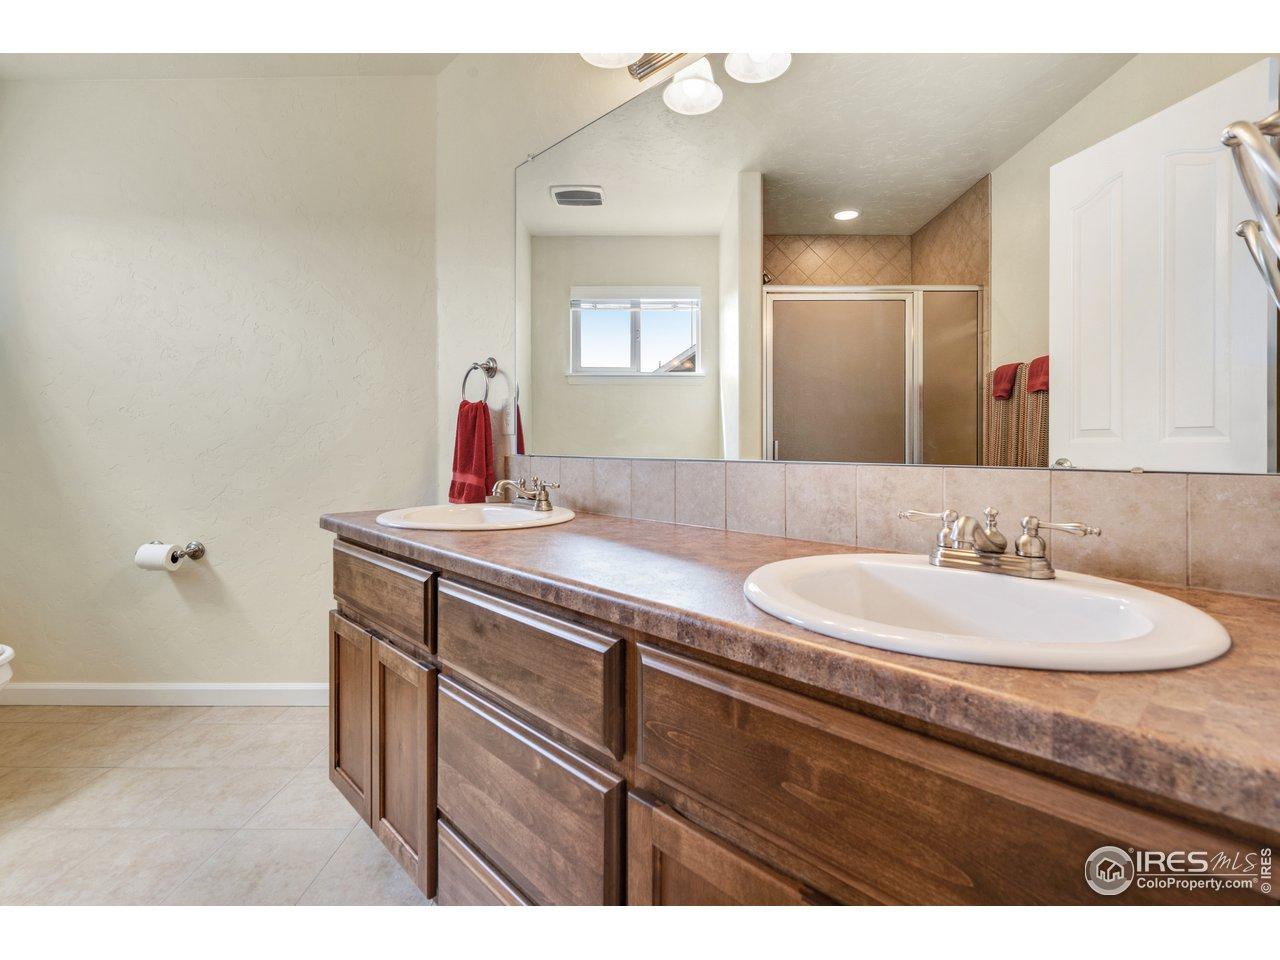 3/4 upstairs bath with double vanity